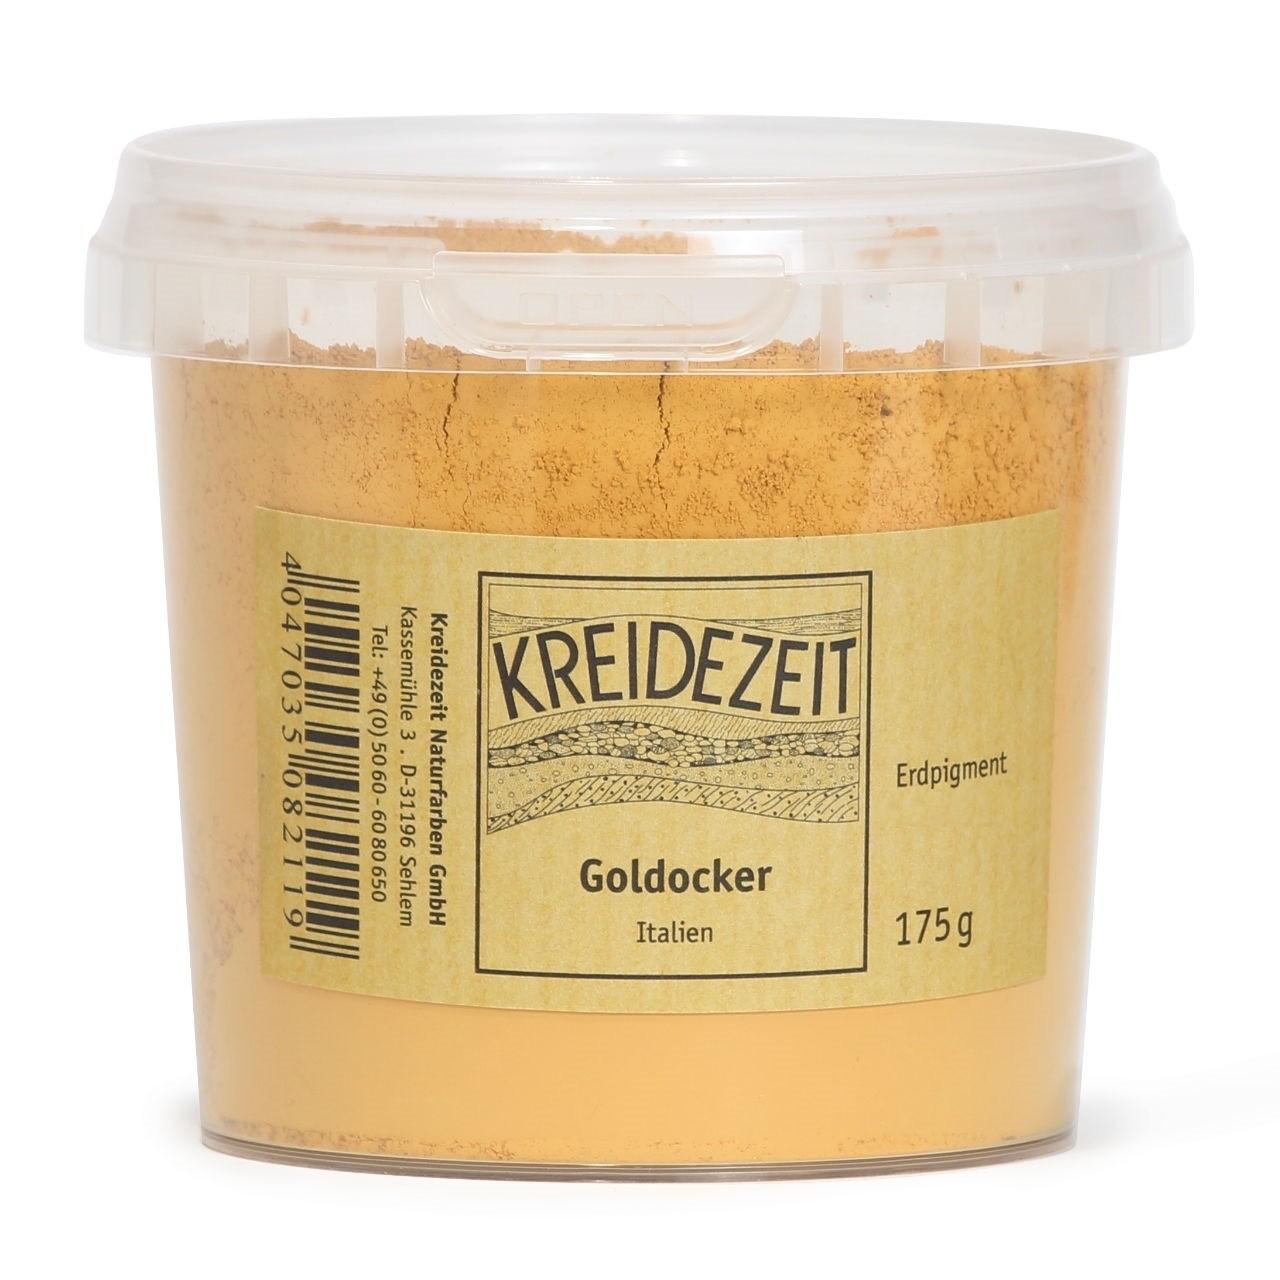 Kreidezeit Pigment Goldocker, Italien